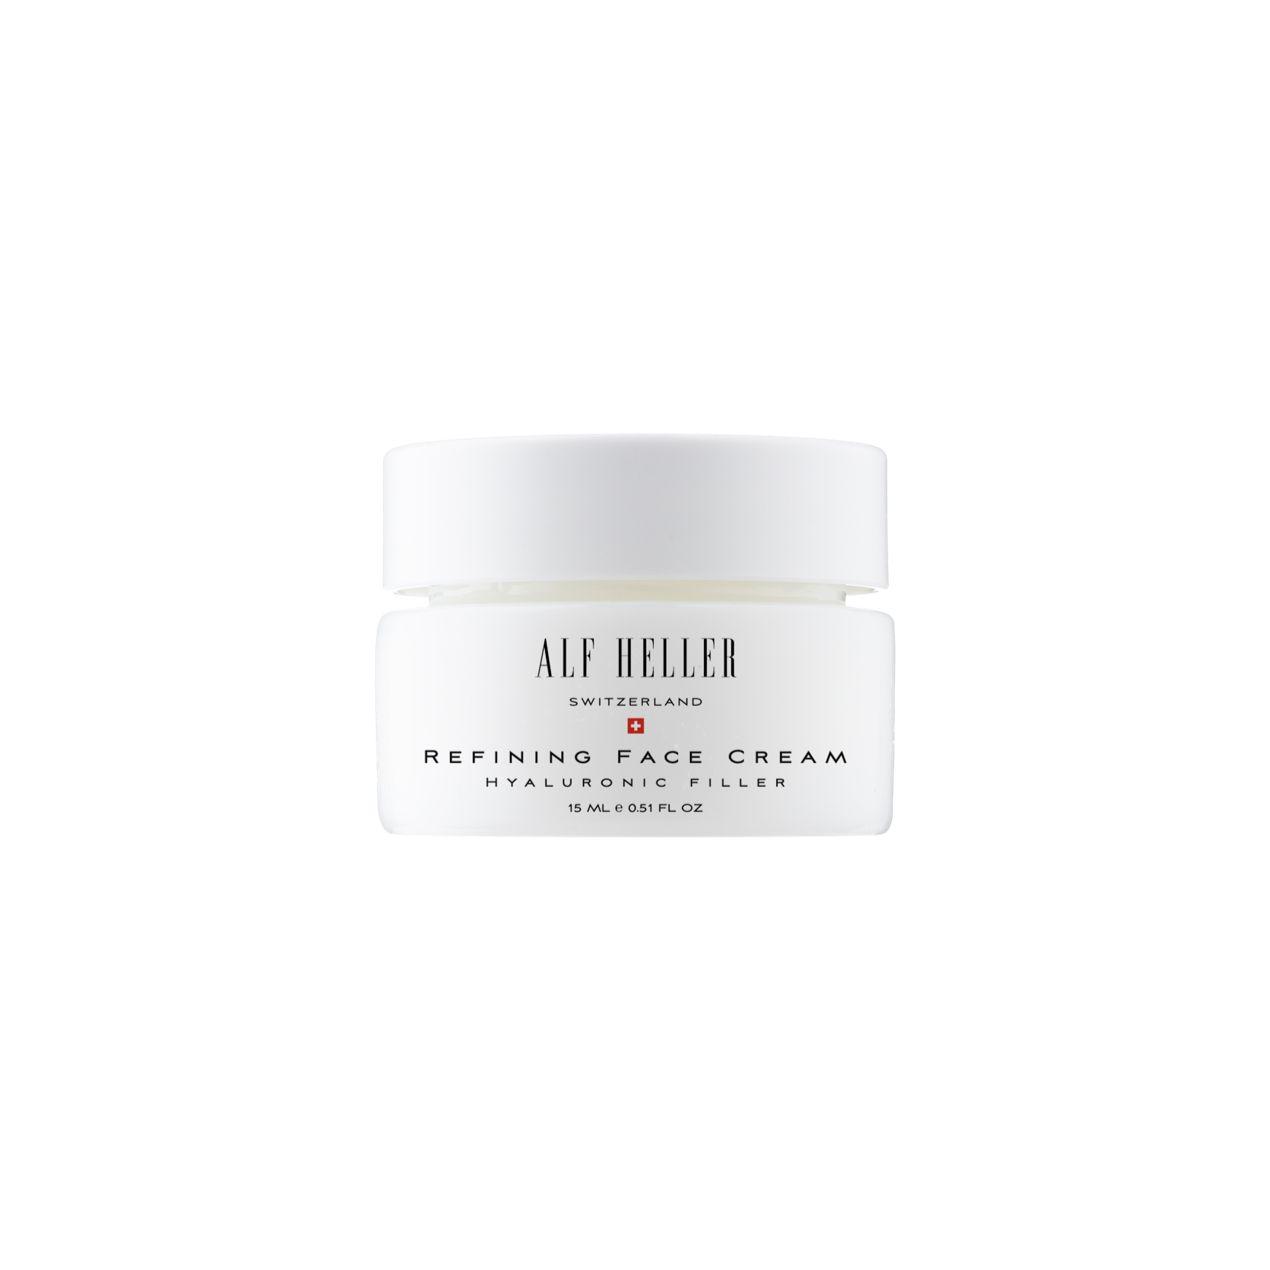 Alf Heller Switzerland-REFINING FACE CREAM 15 ml